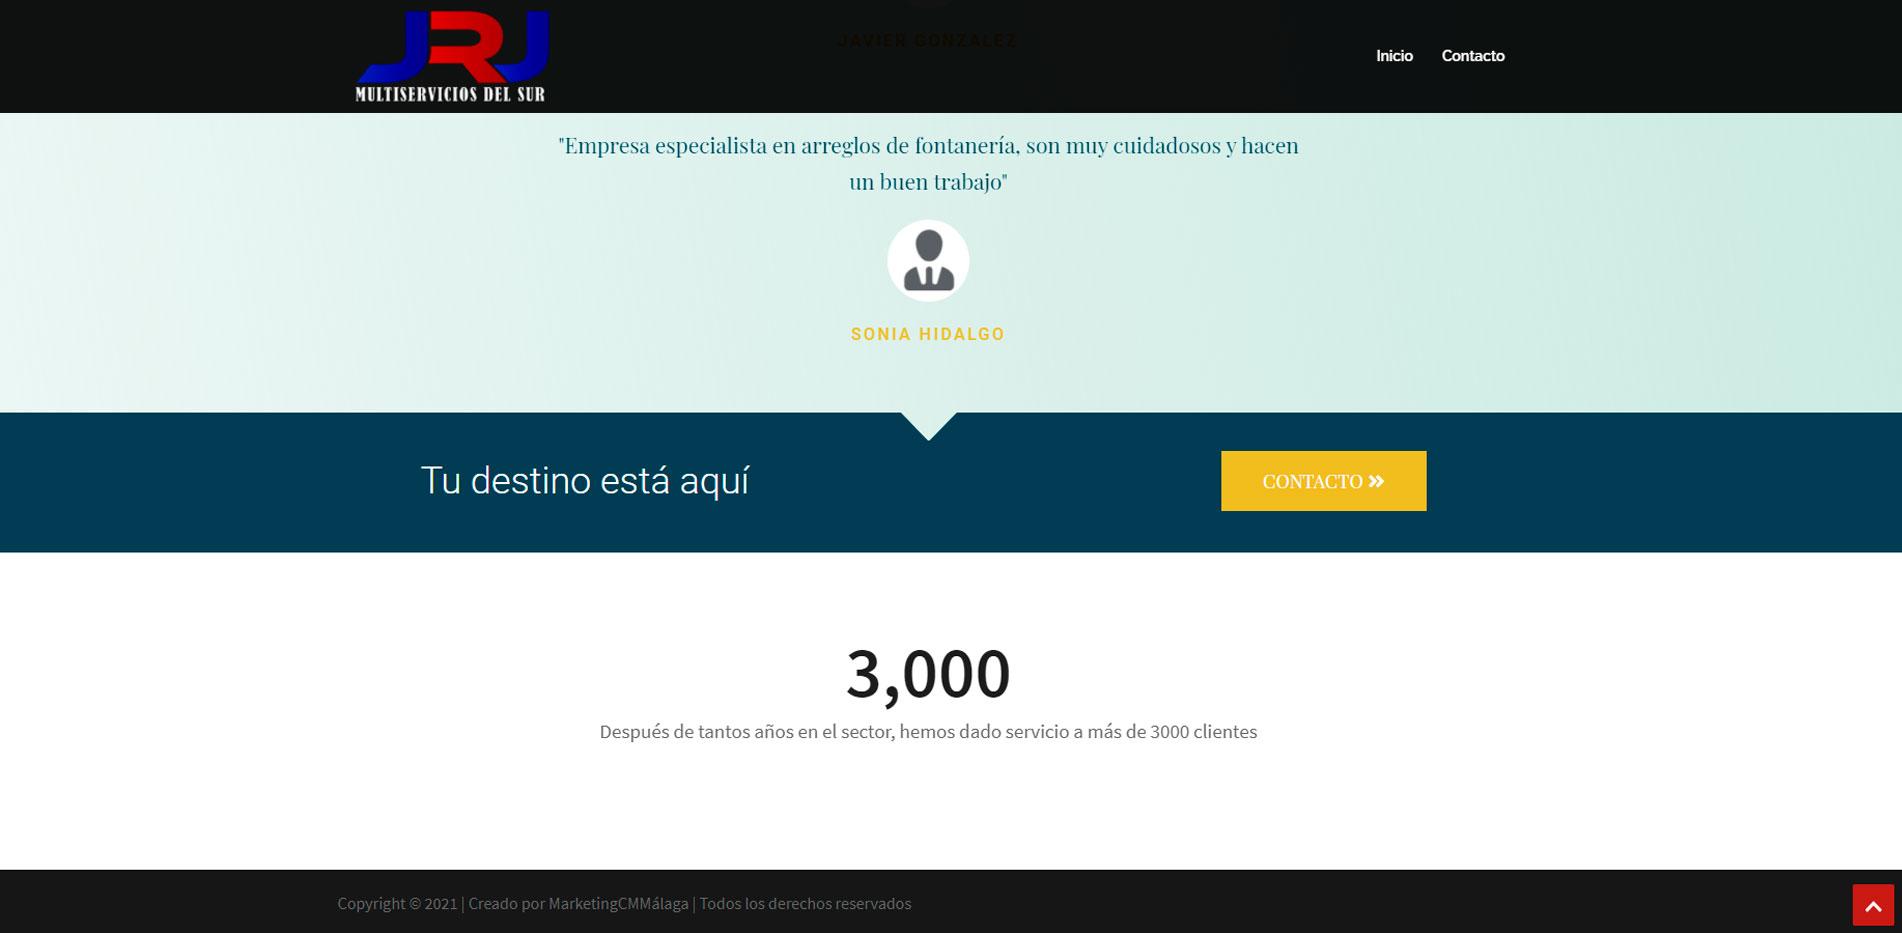 Captura-de-pantalla-MultiserviciosJRJ-3-1902x933